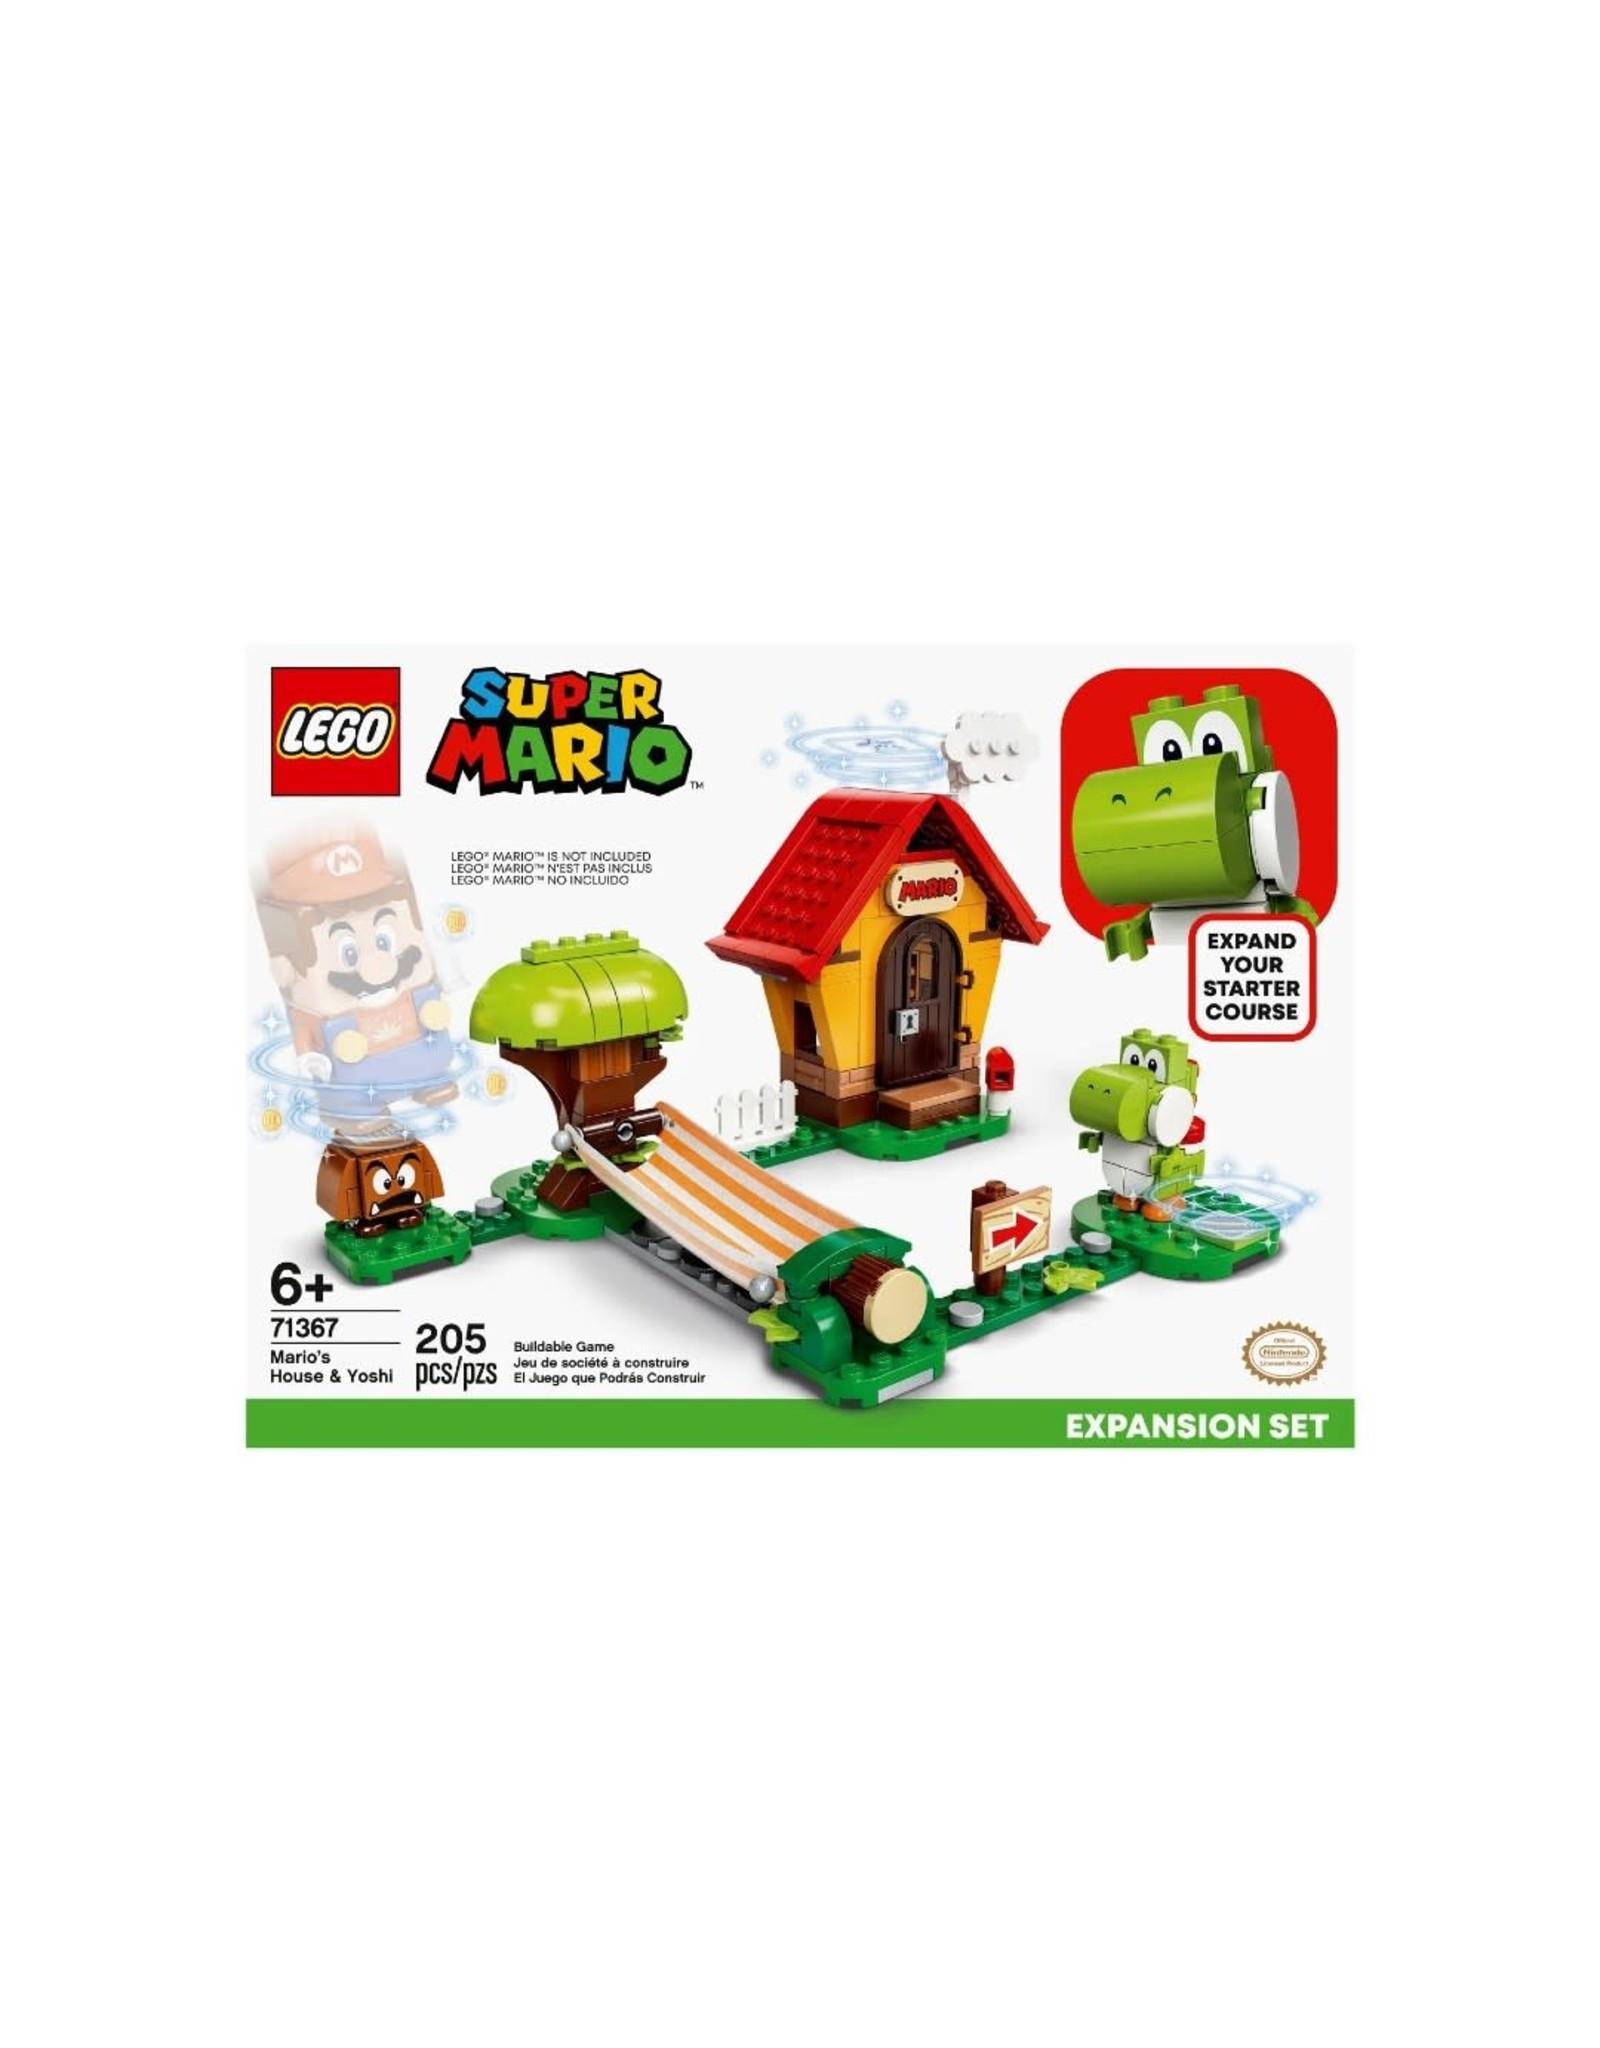 LEGO Mario's House & Yoshi Exp Set